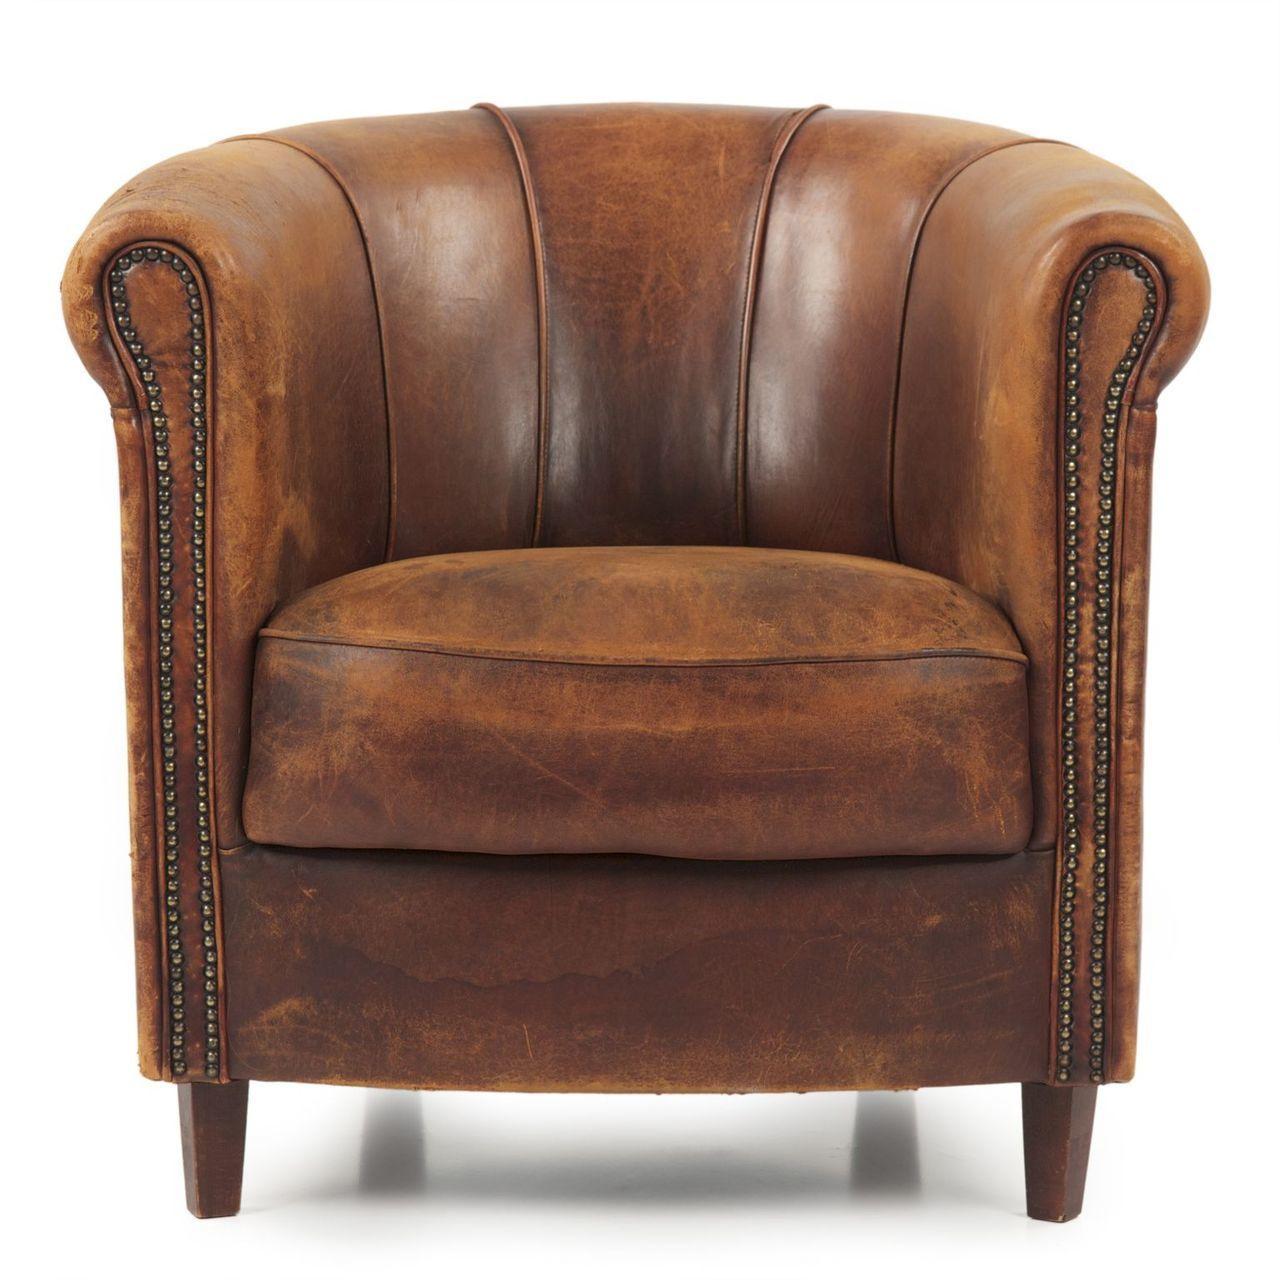 Art Deco Style Sheep Leather Club Chair By Joris Sheep